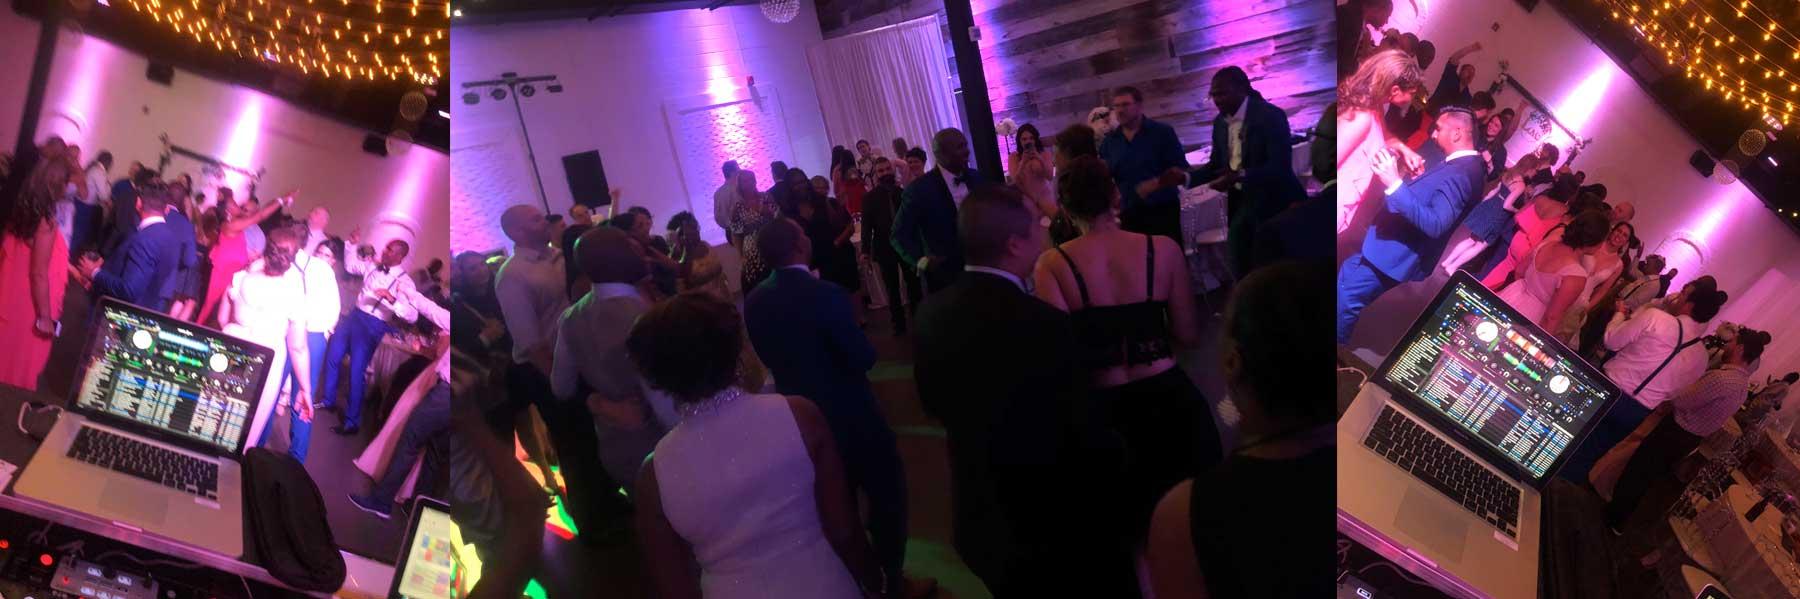 YMG-York-Mills-Gallery-Toronto-Wedding-DJ